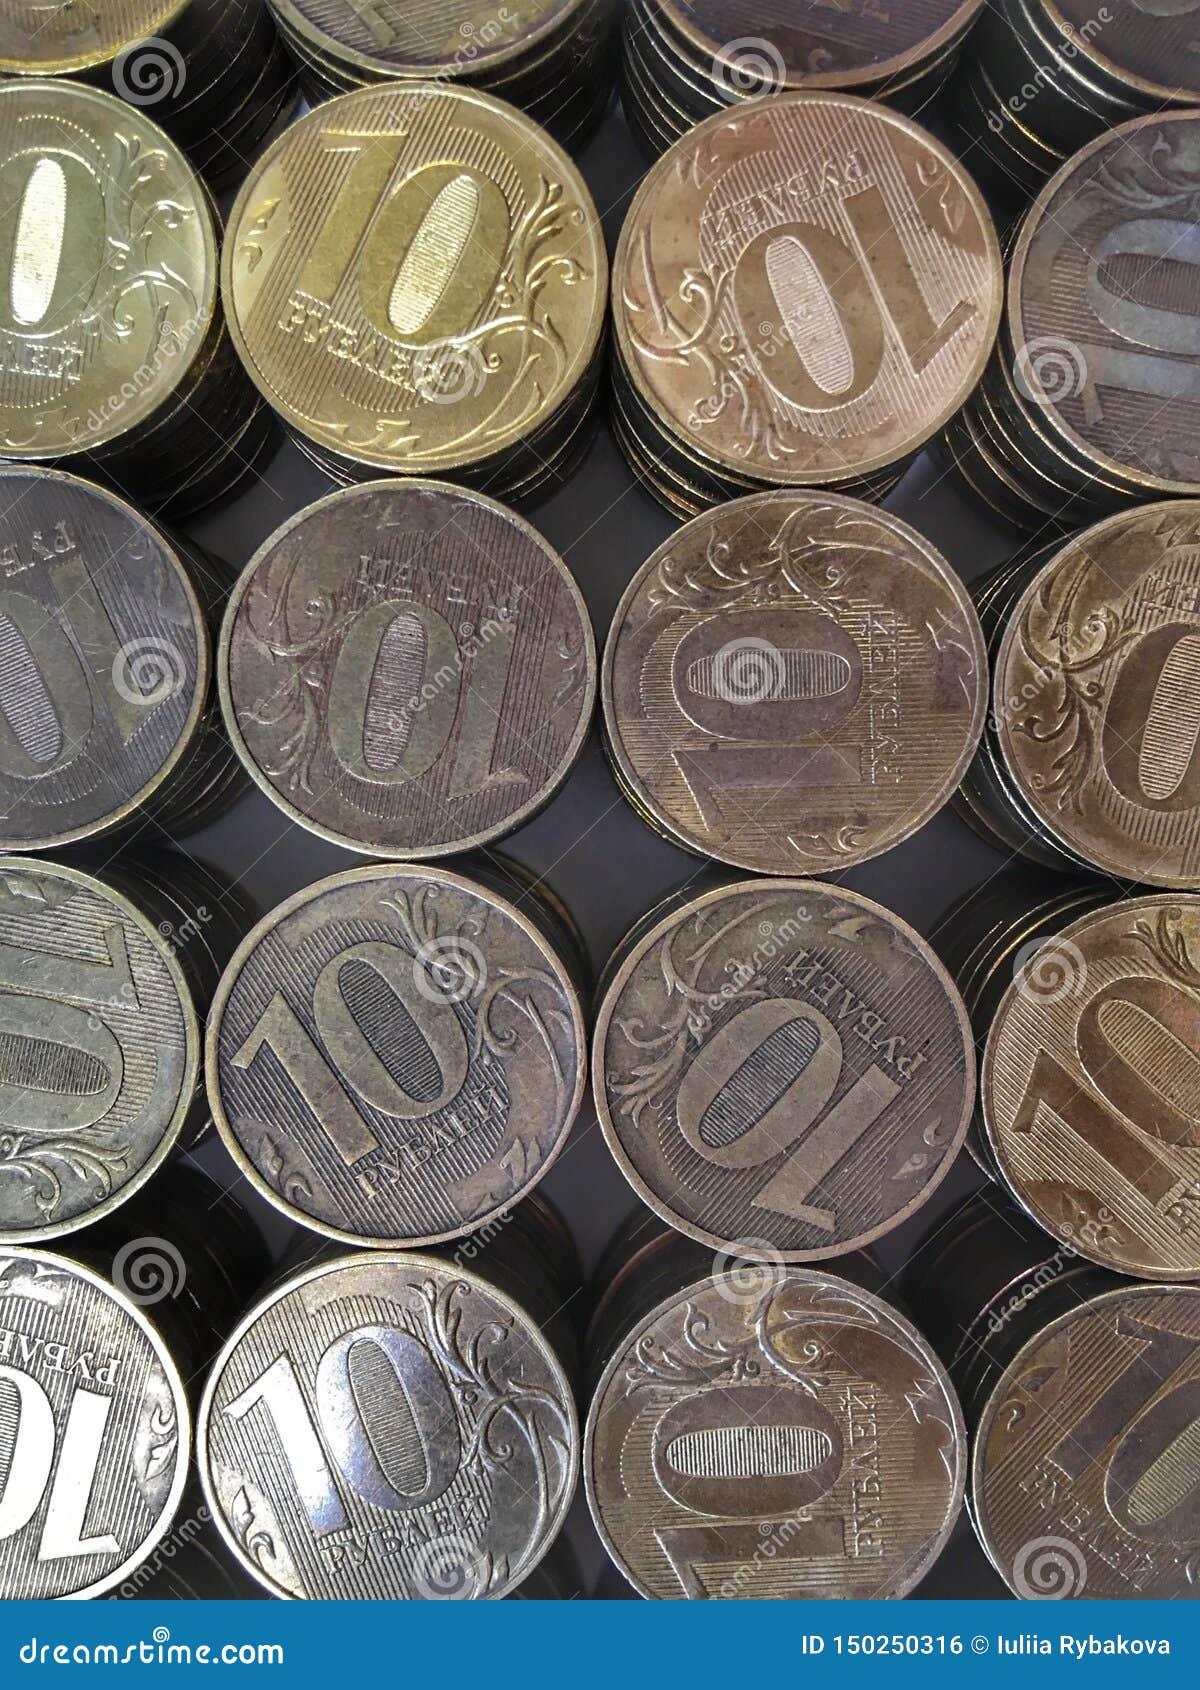 The Russian coin ten rubles vertical frame.